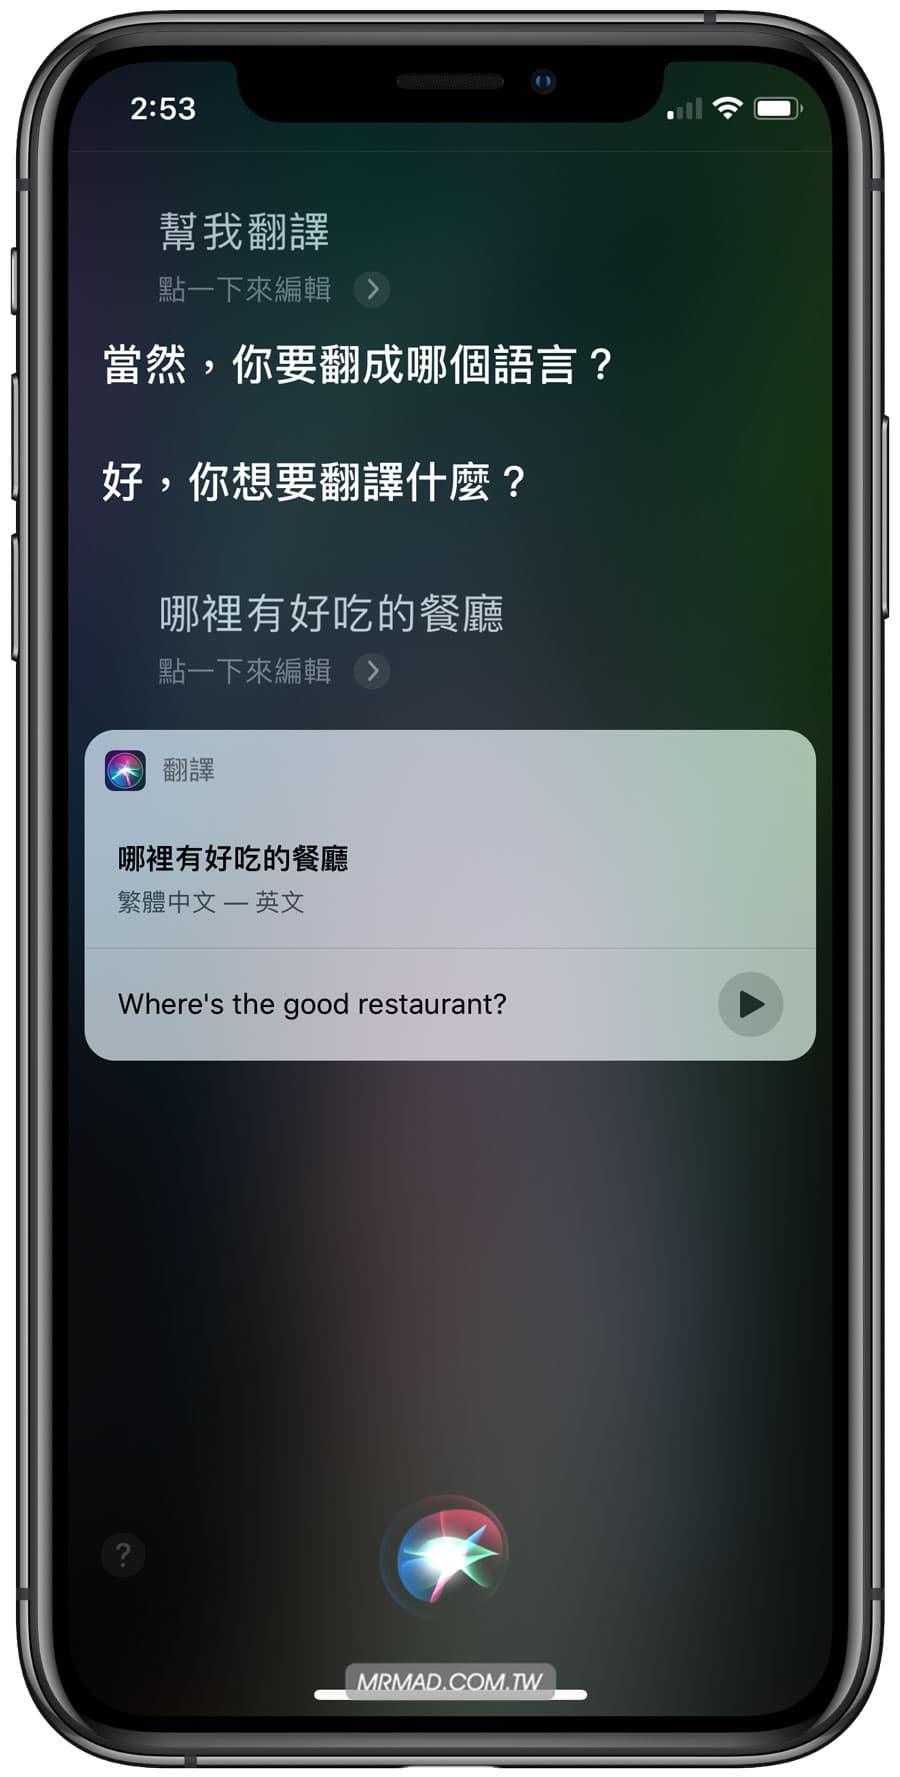 Siri 當翻譯機也沒問題!出國旅行不怕開不了口 - 瘋先生